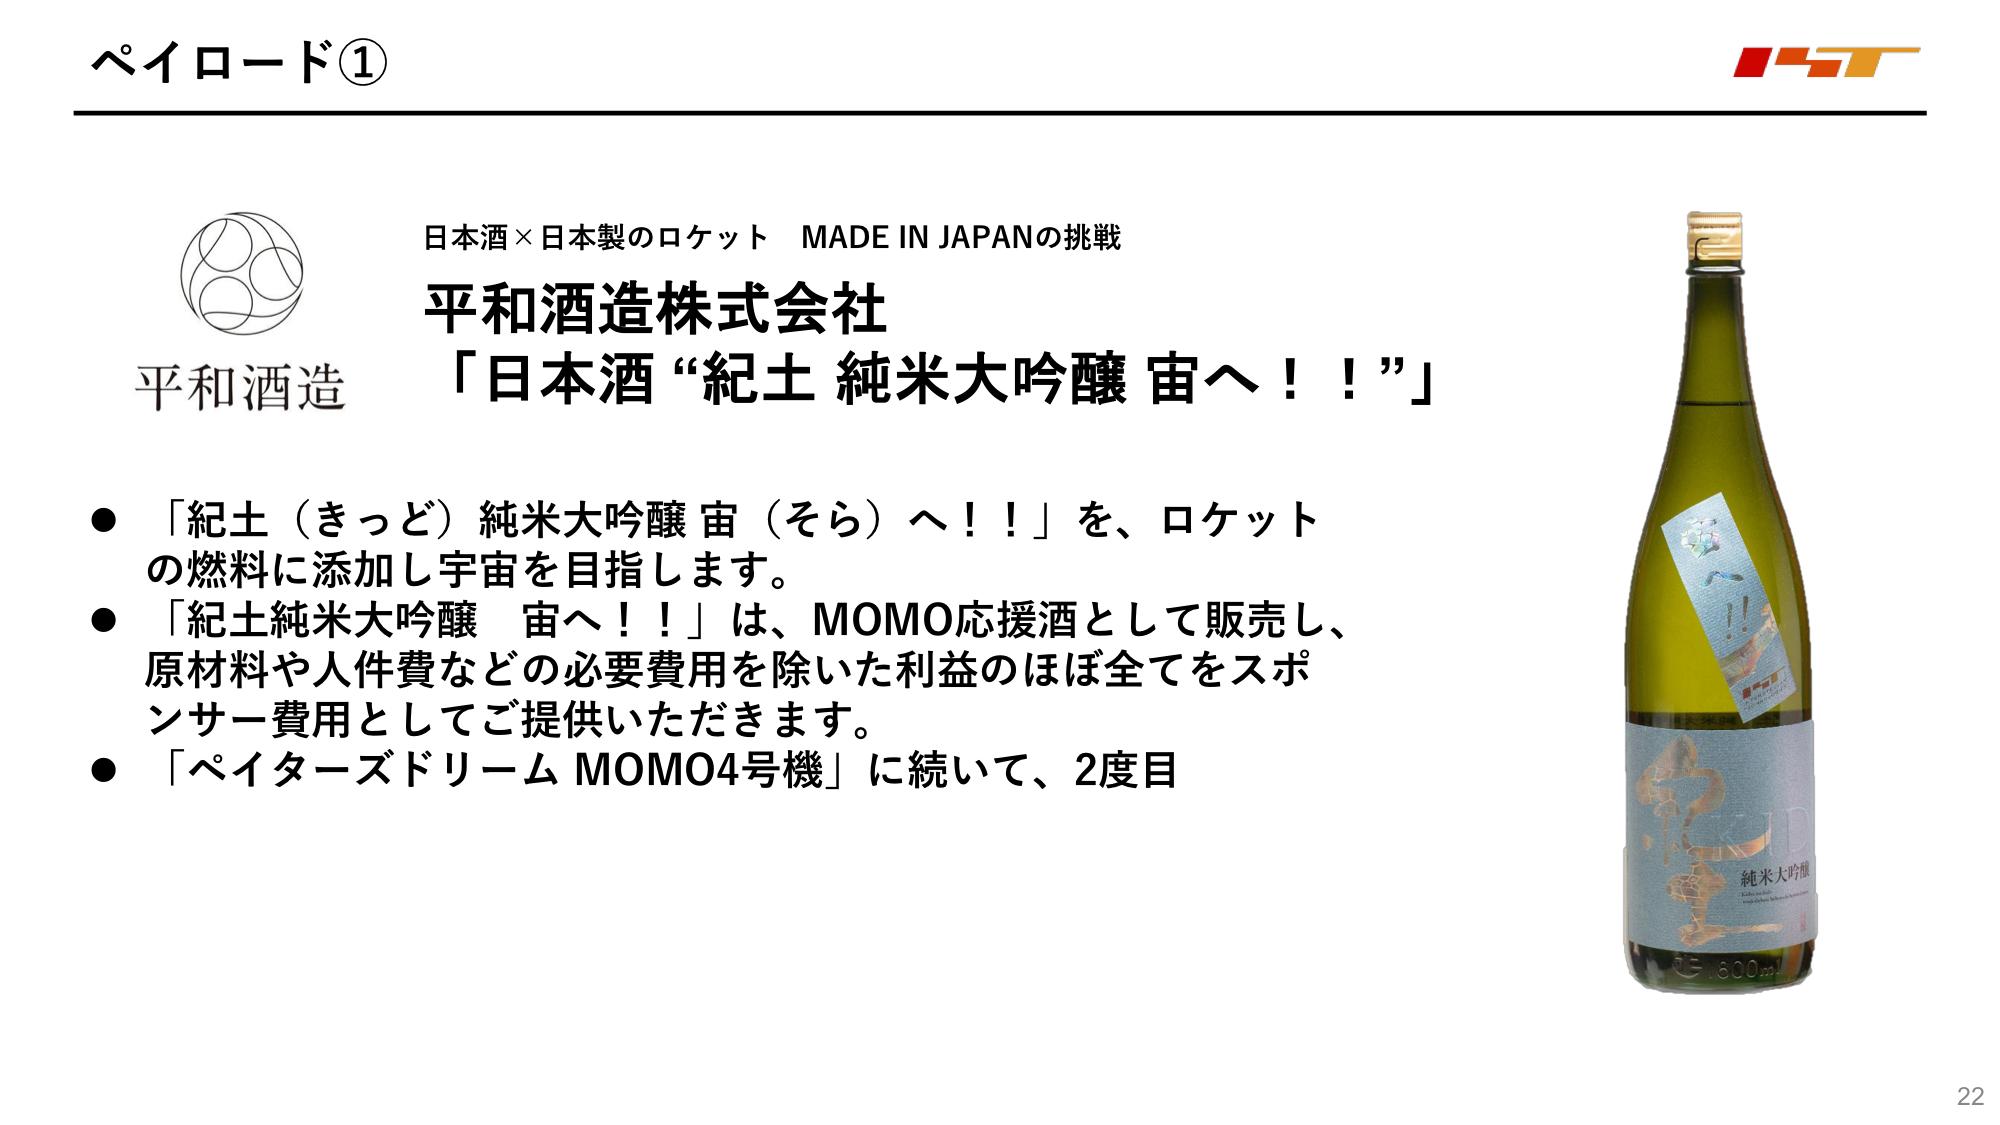 f:id:Imamura:20191126135217p:plain